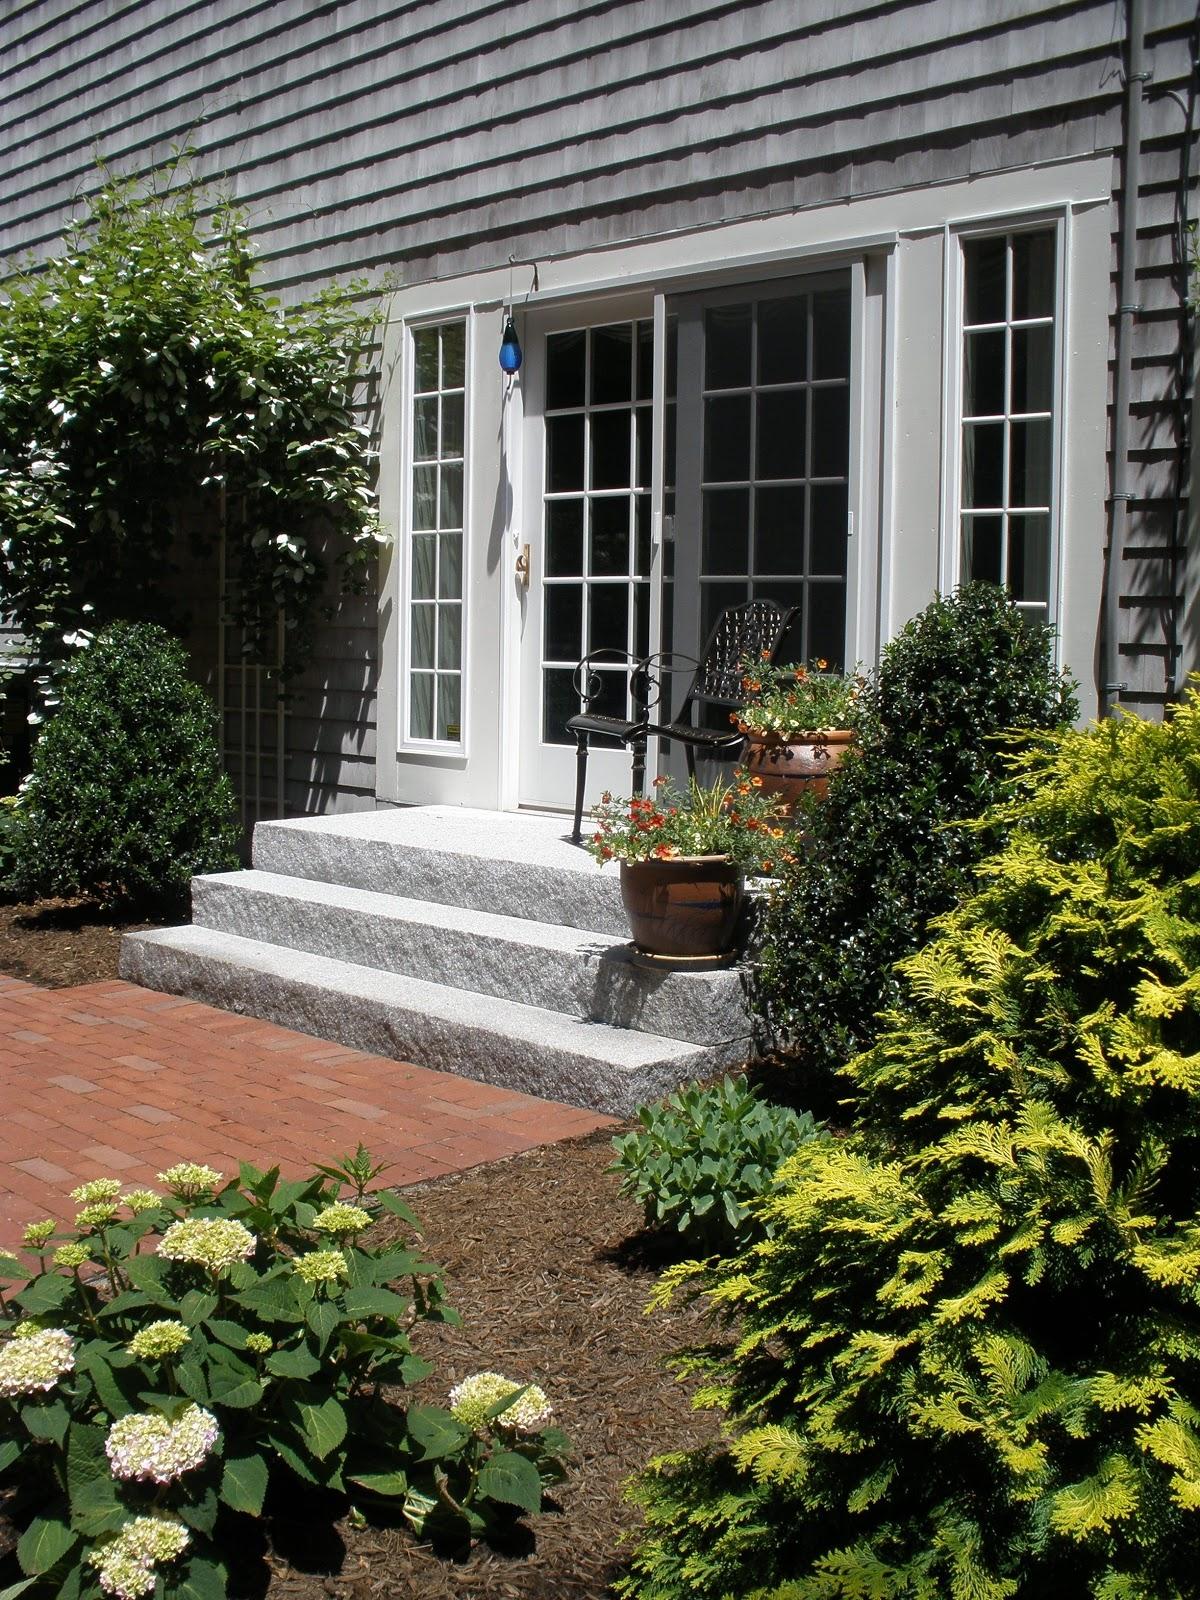 A set of Woodbury Gray granite steps